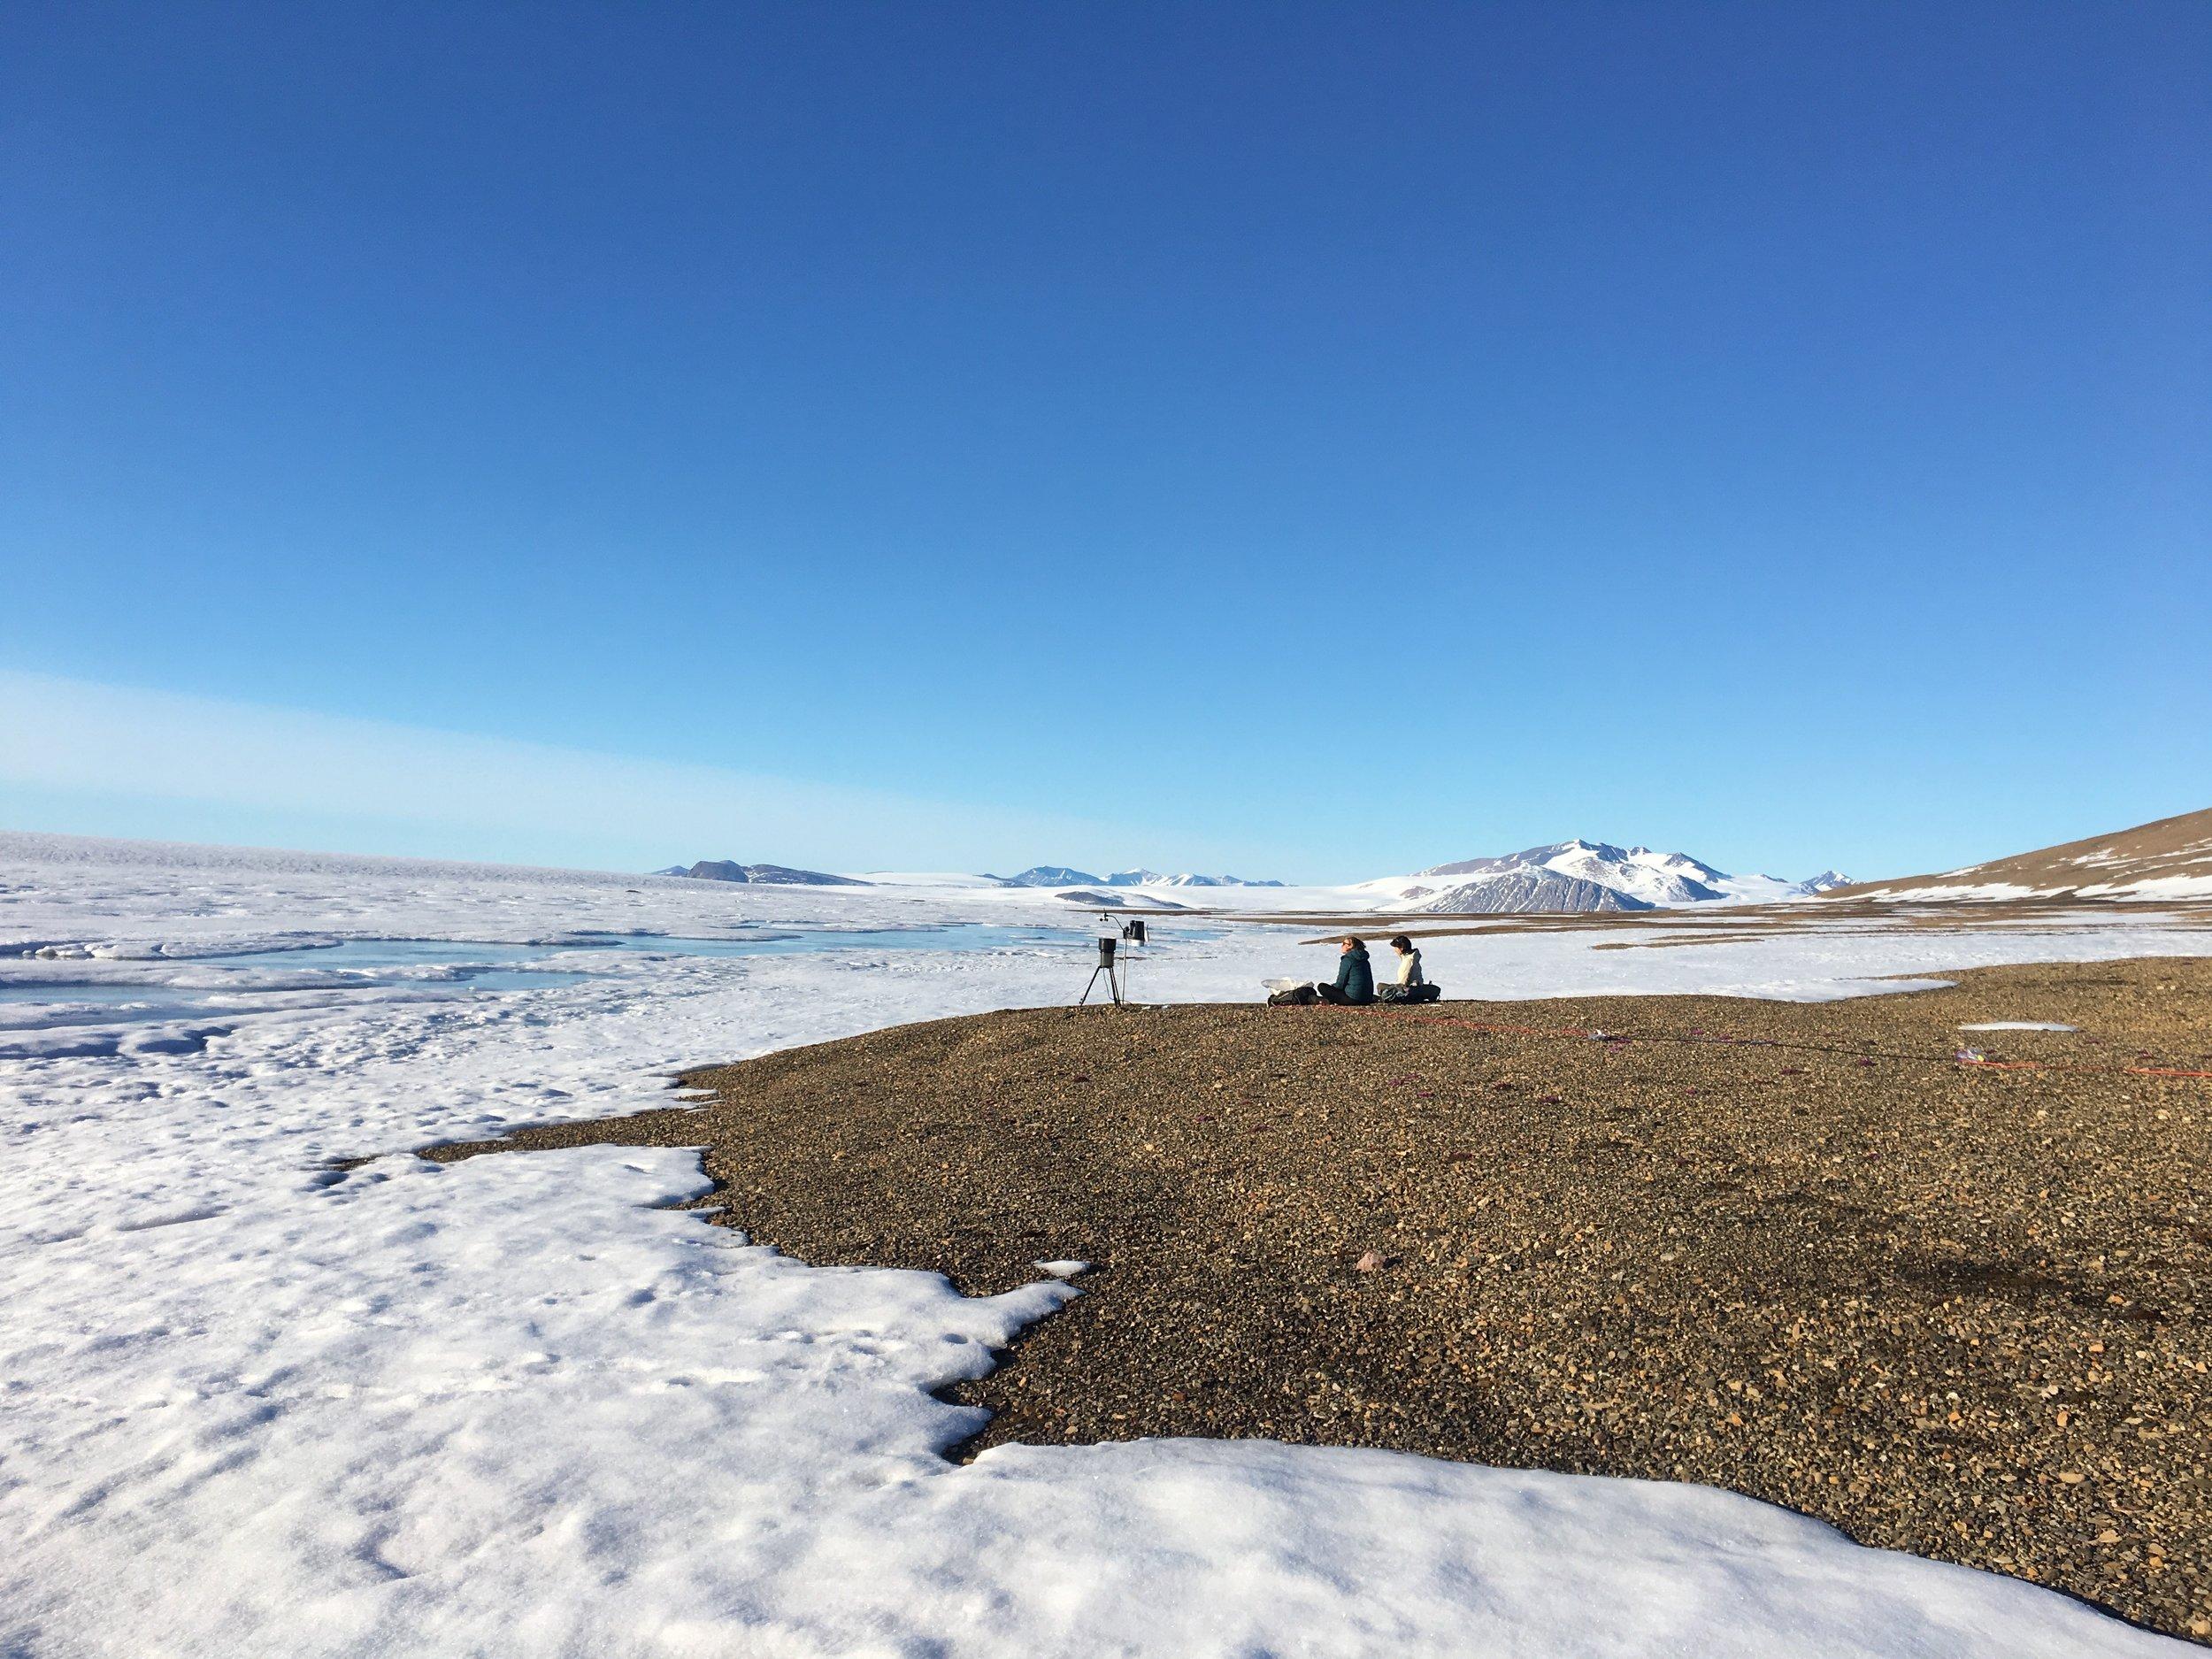 Catherine Girard and Elise Imbeau collecting aerosols near the lagoon on Ward Hunt Island